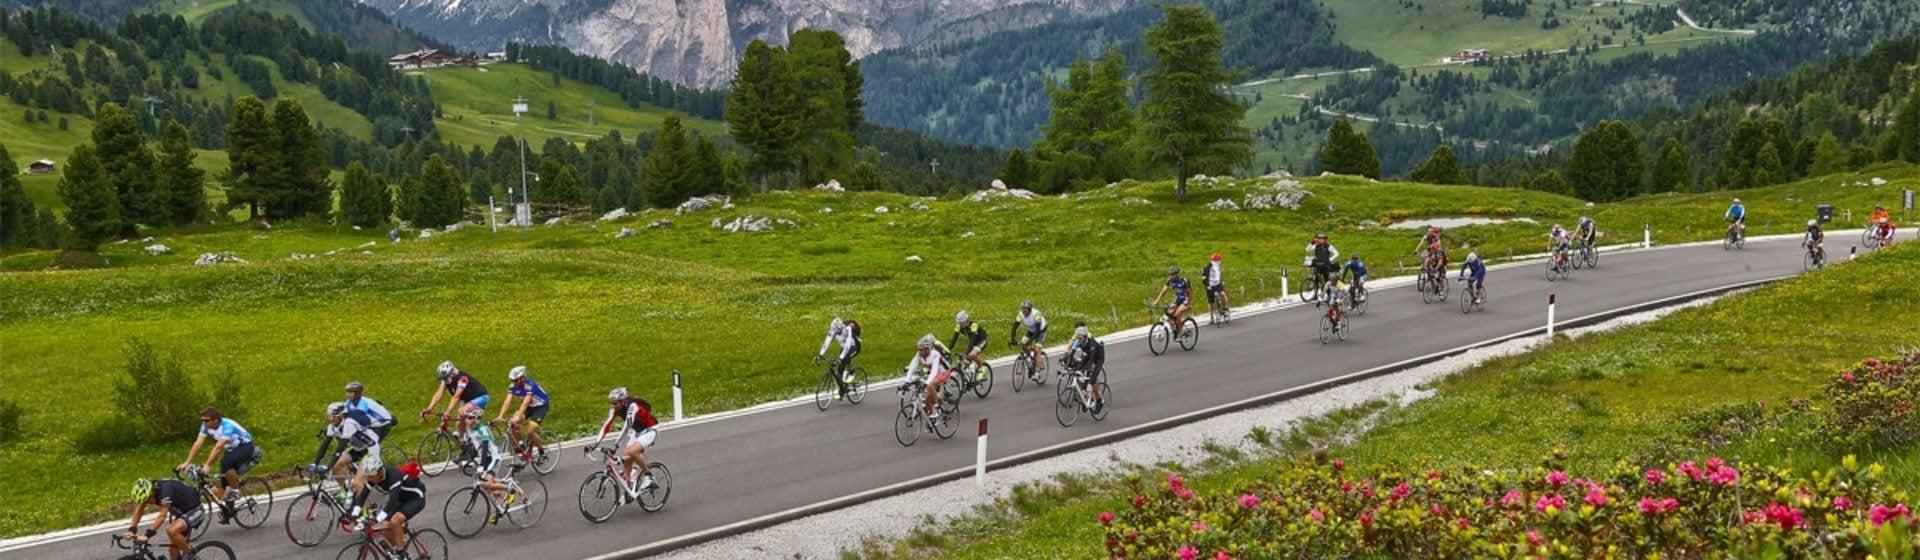 Saturday 18th September 2021: Sellaronda Bike Day autumn edition